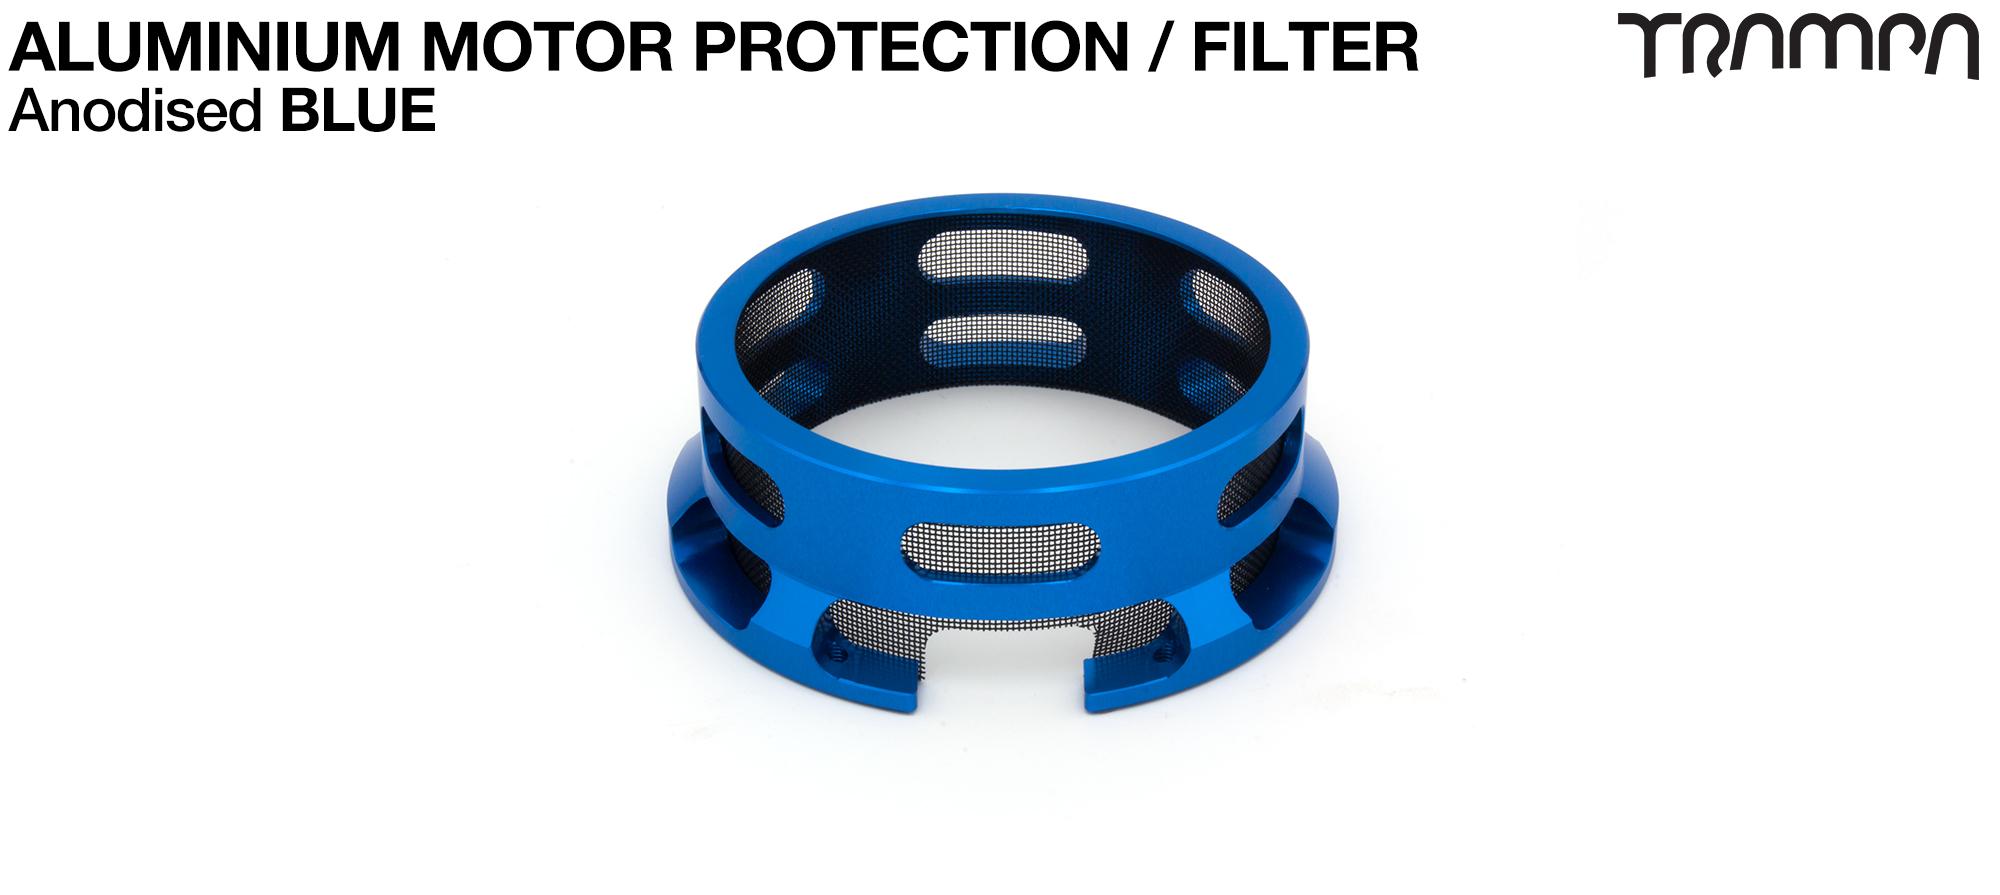 Aluminium Motor protection - BLUE